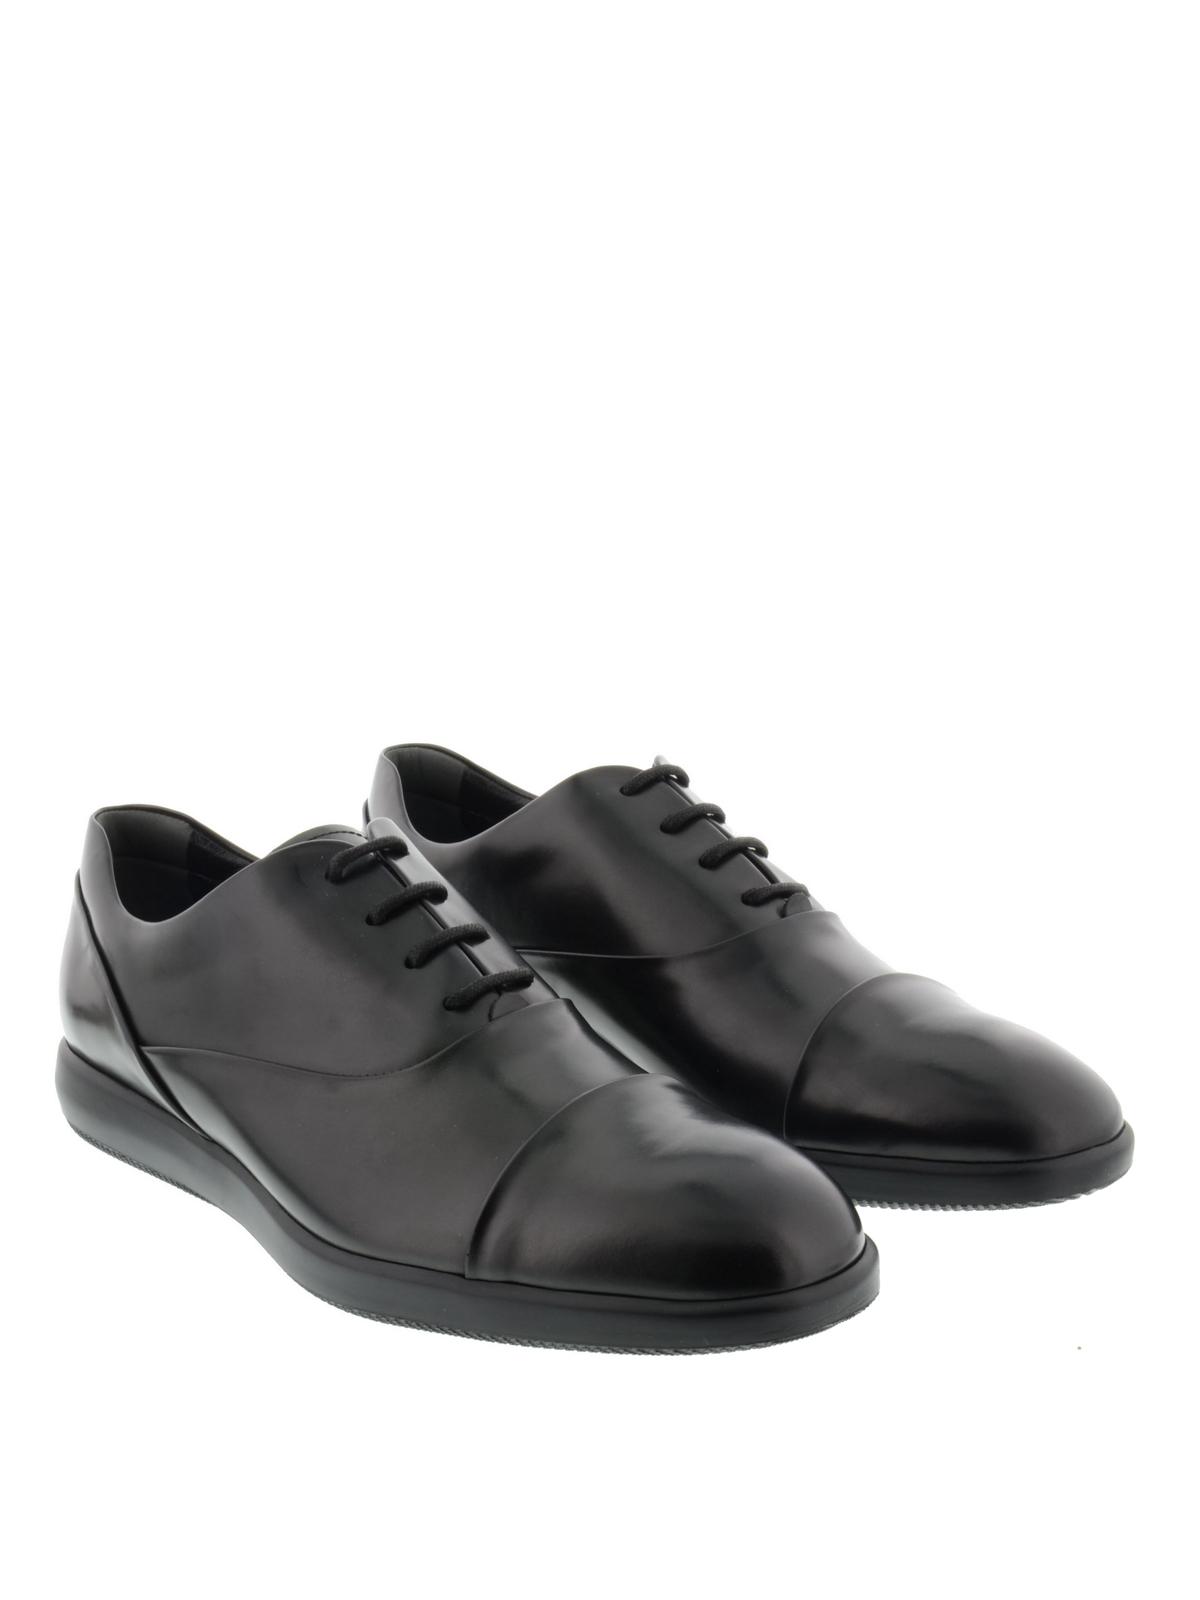 Lace-ups shoes Hogan - Dress X - H209 - HXM2090H6016Q6B999 | iKRIX.com